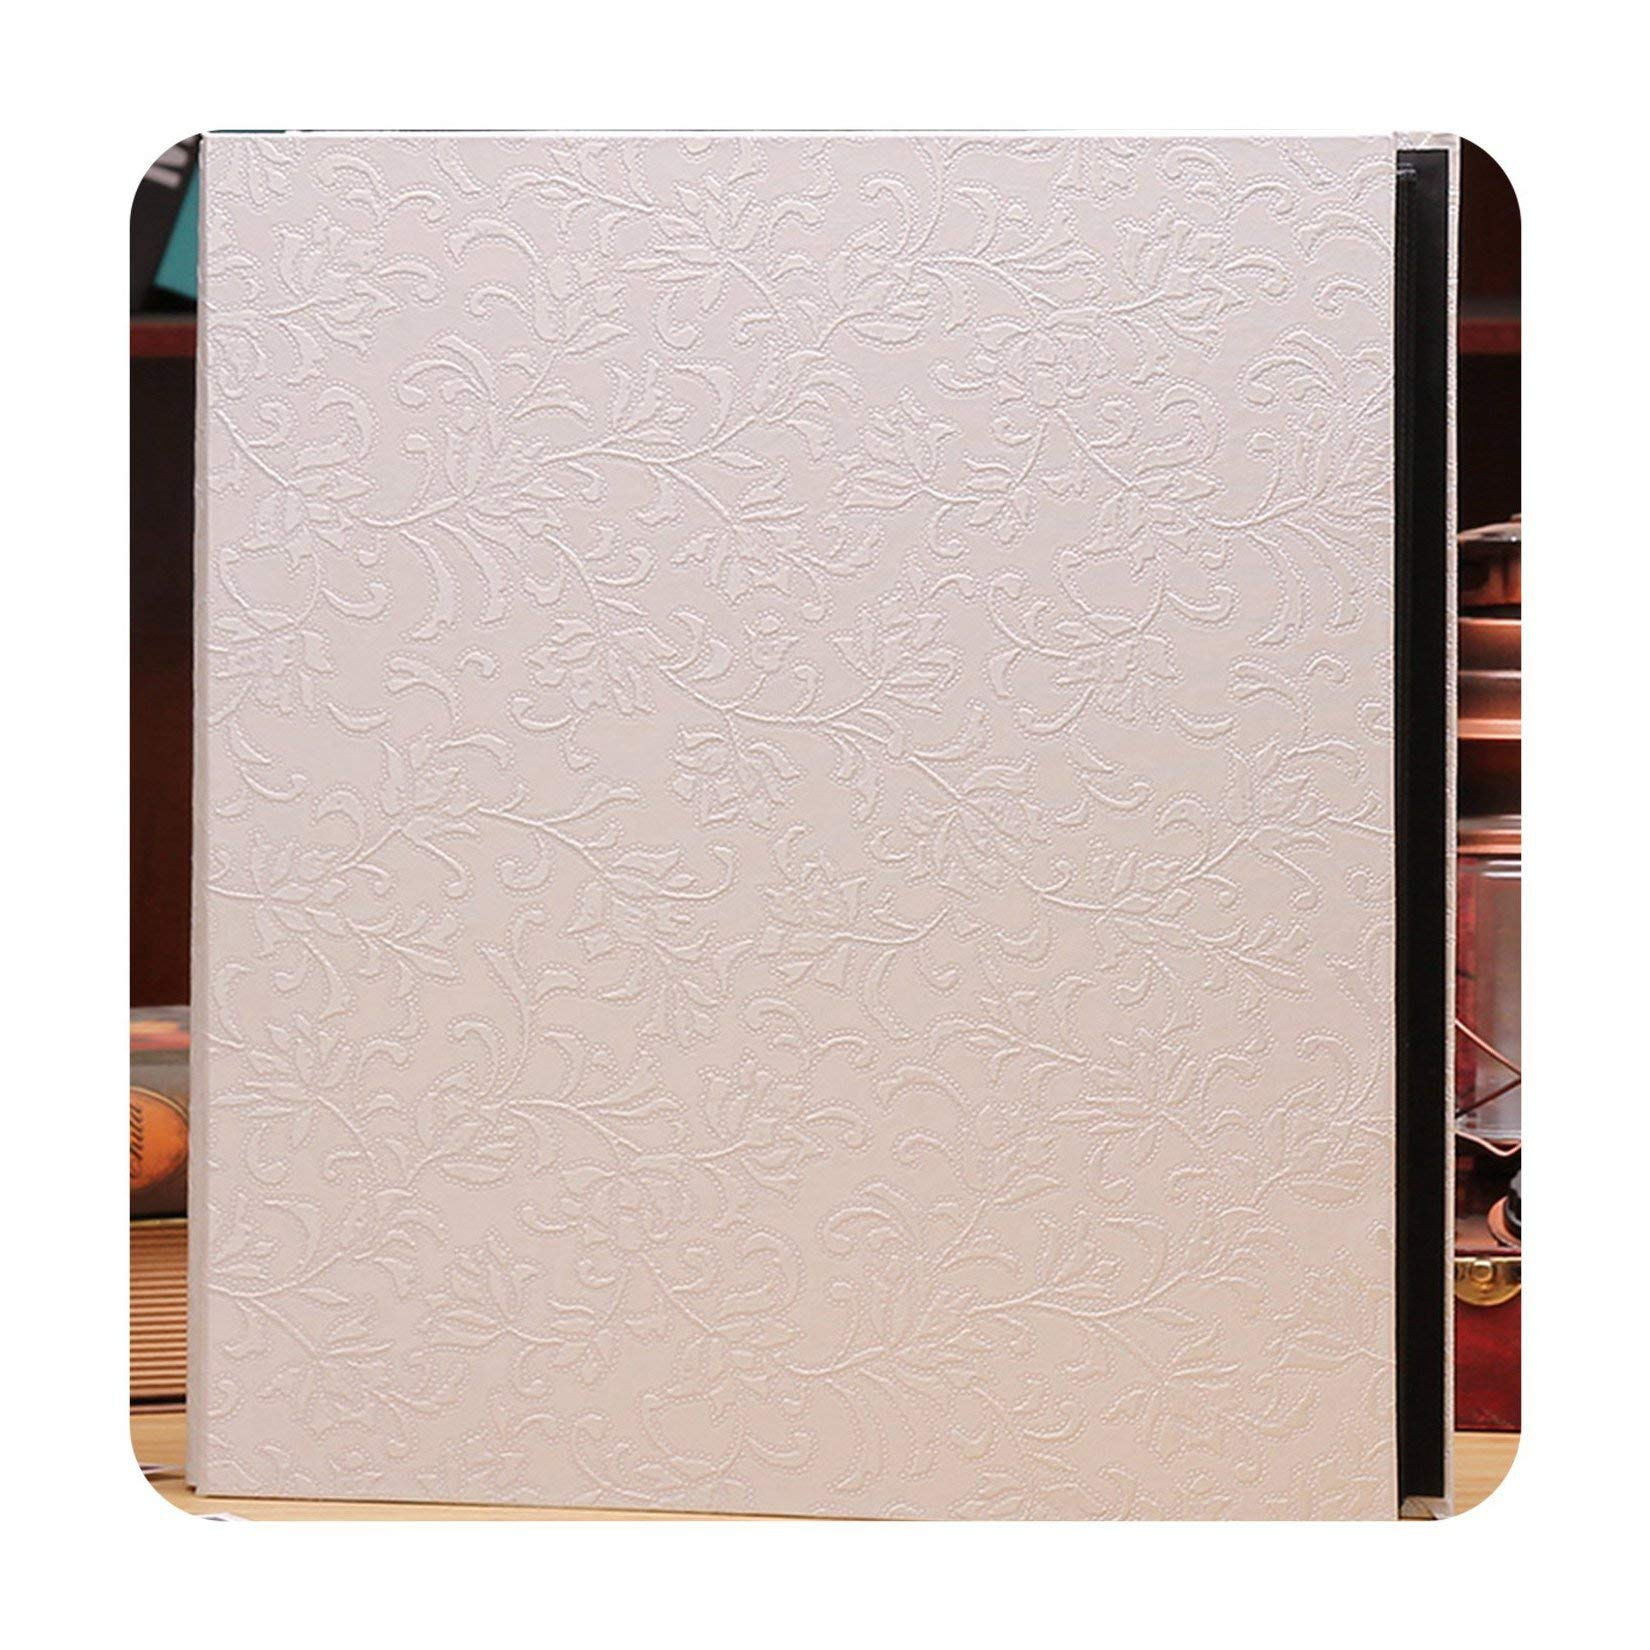 foosheeonzi 6 Inch 800 Plastic Pockets Photo Album Family Insert Large Capacity Leather Cover Gallery Family Memory Record Scrapbook Album,3